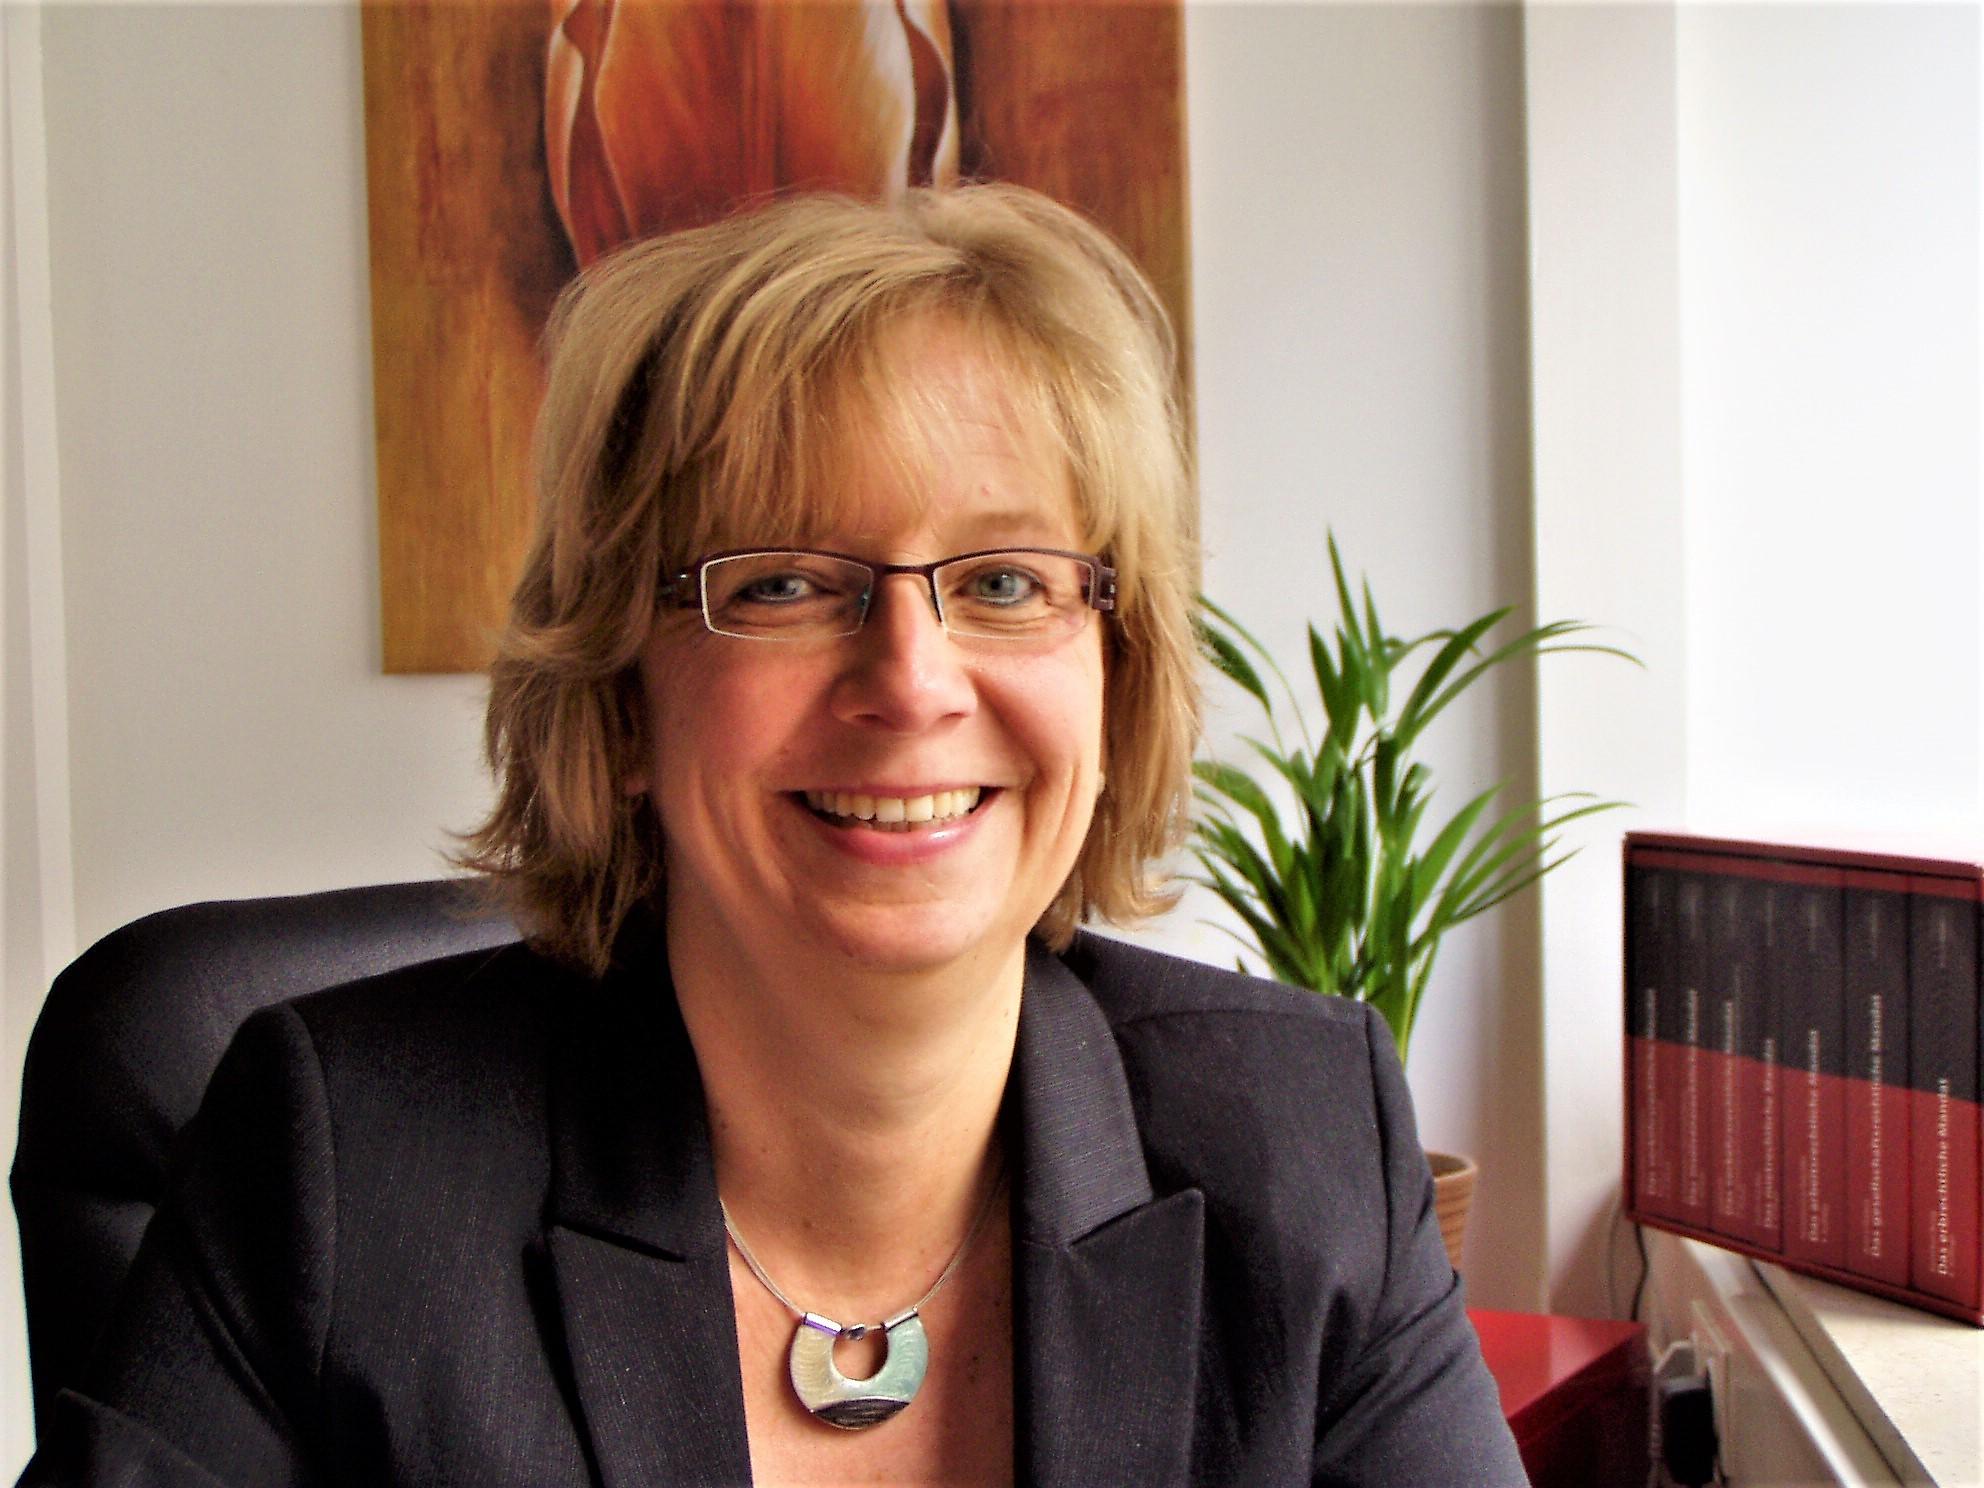 Rechtsanwältin Melanie Randel